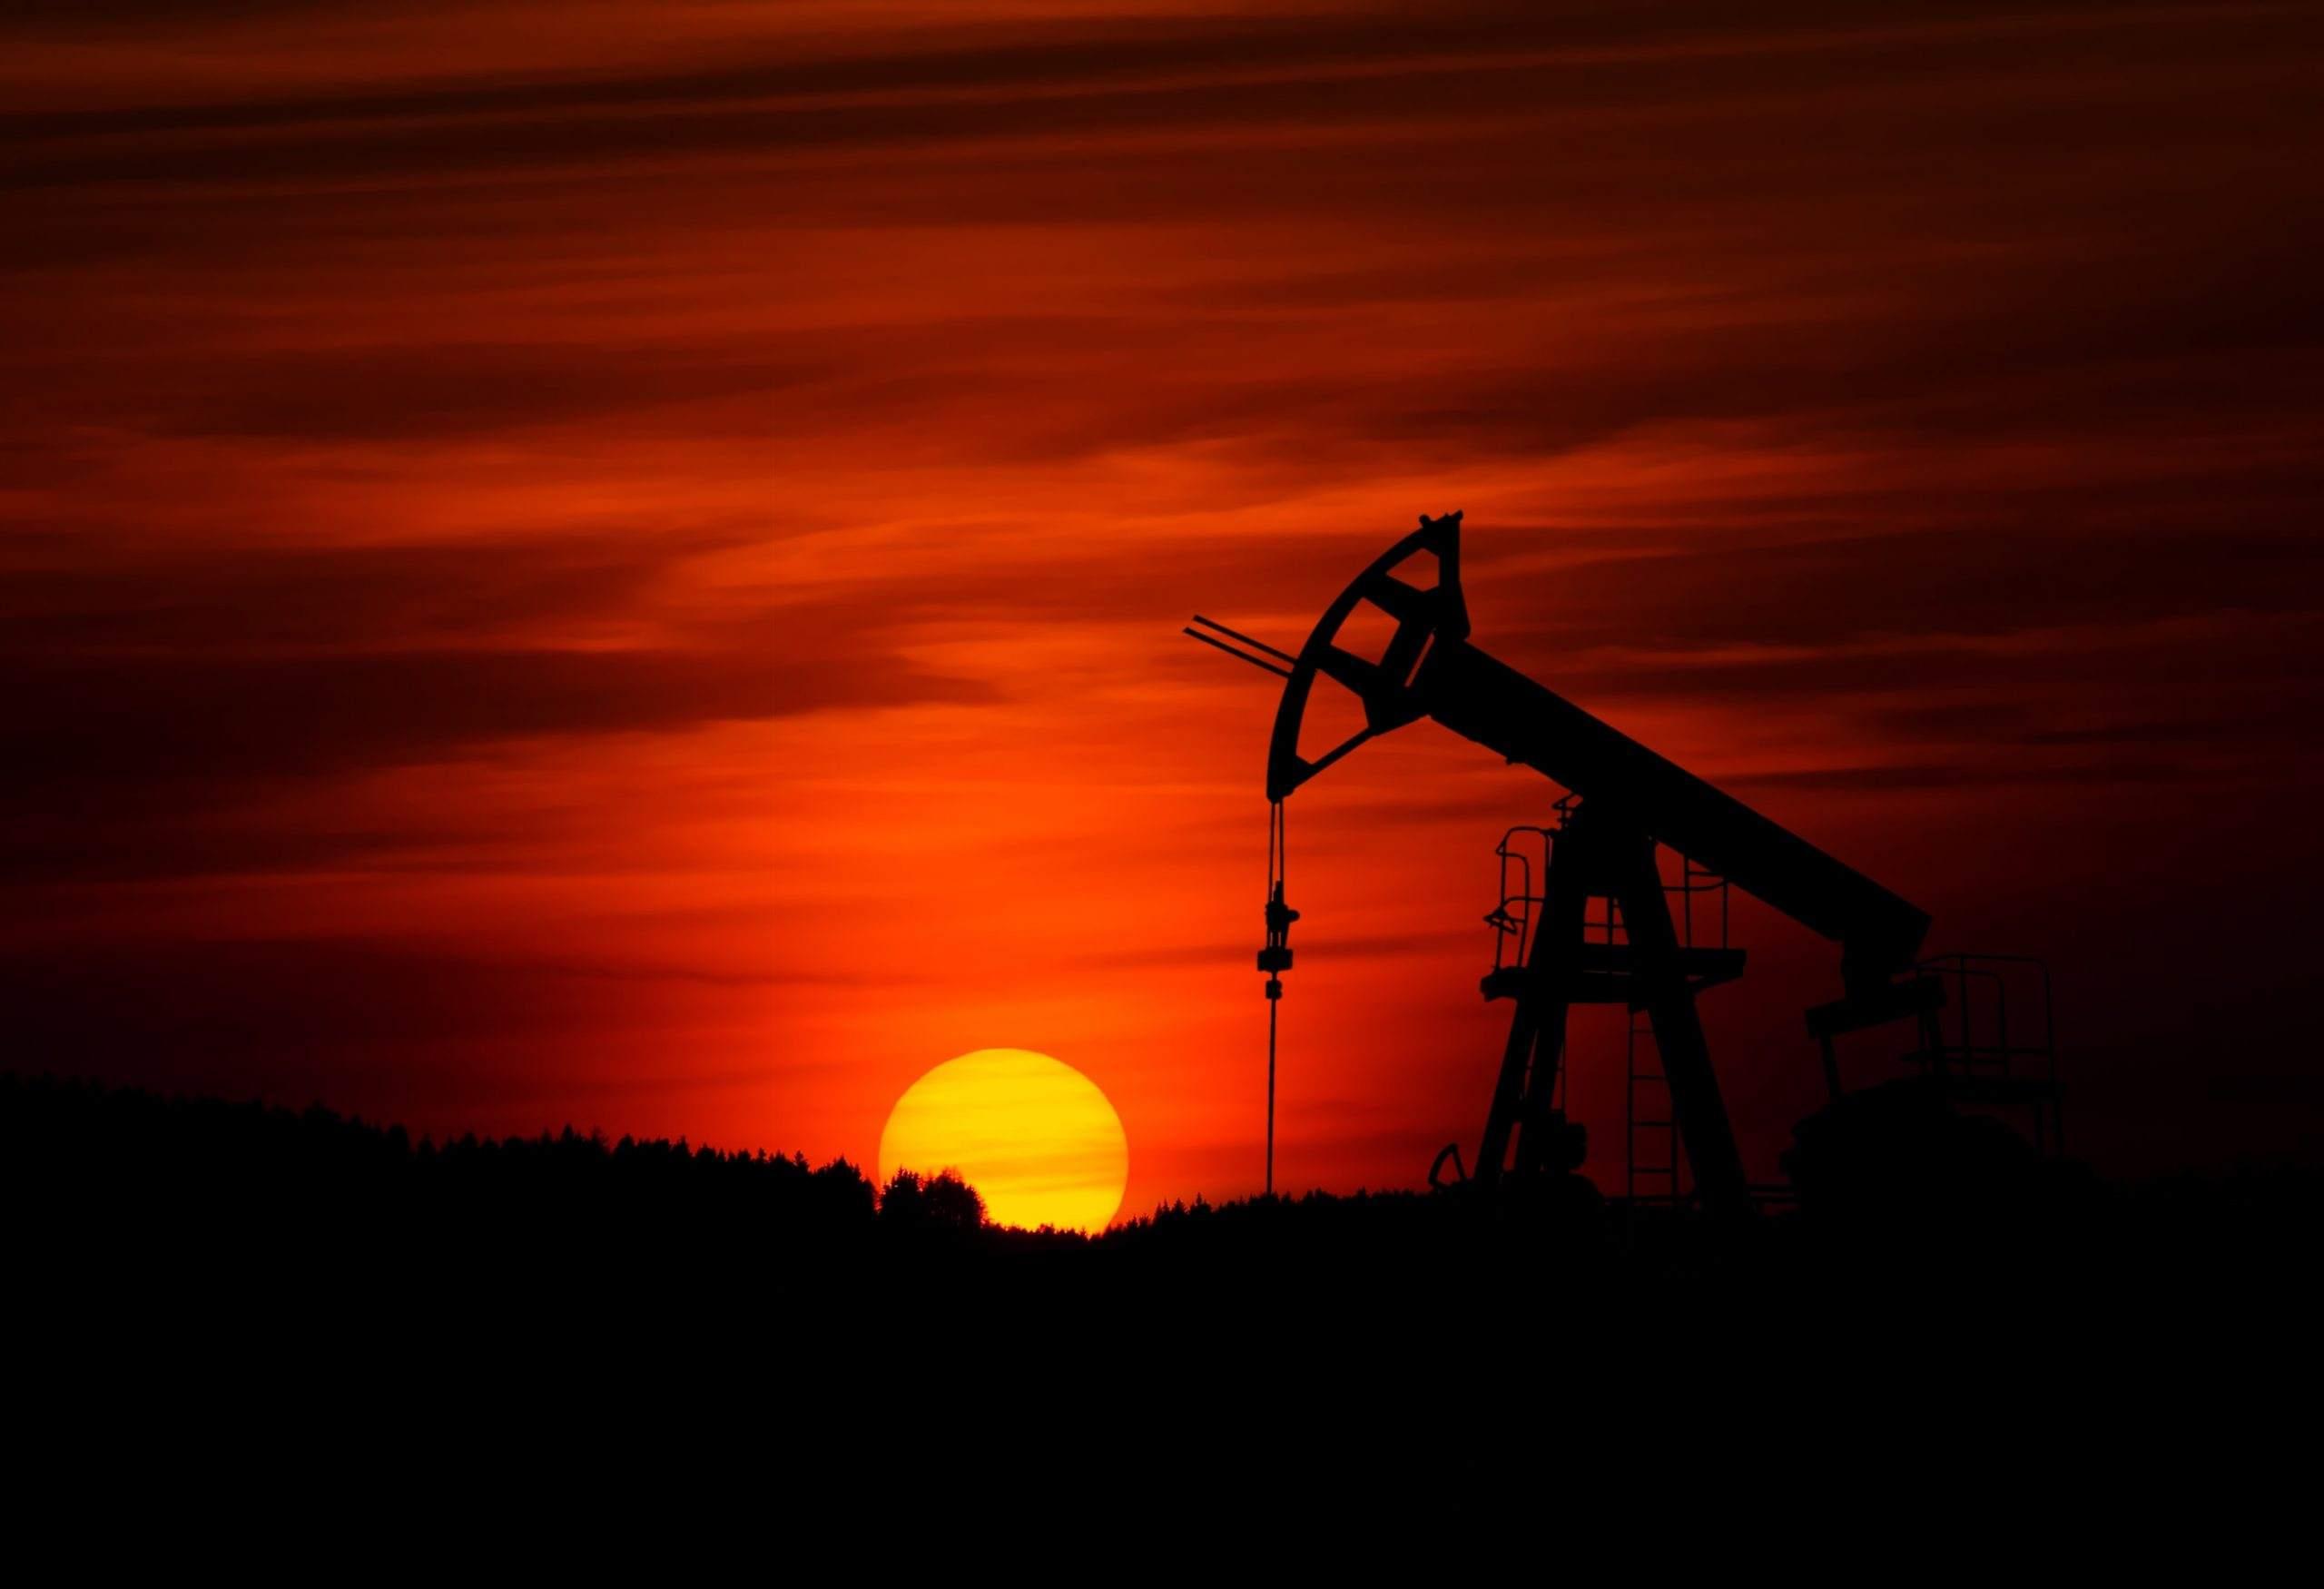 Ölpumpe vor Sonnenuntergang